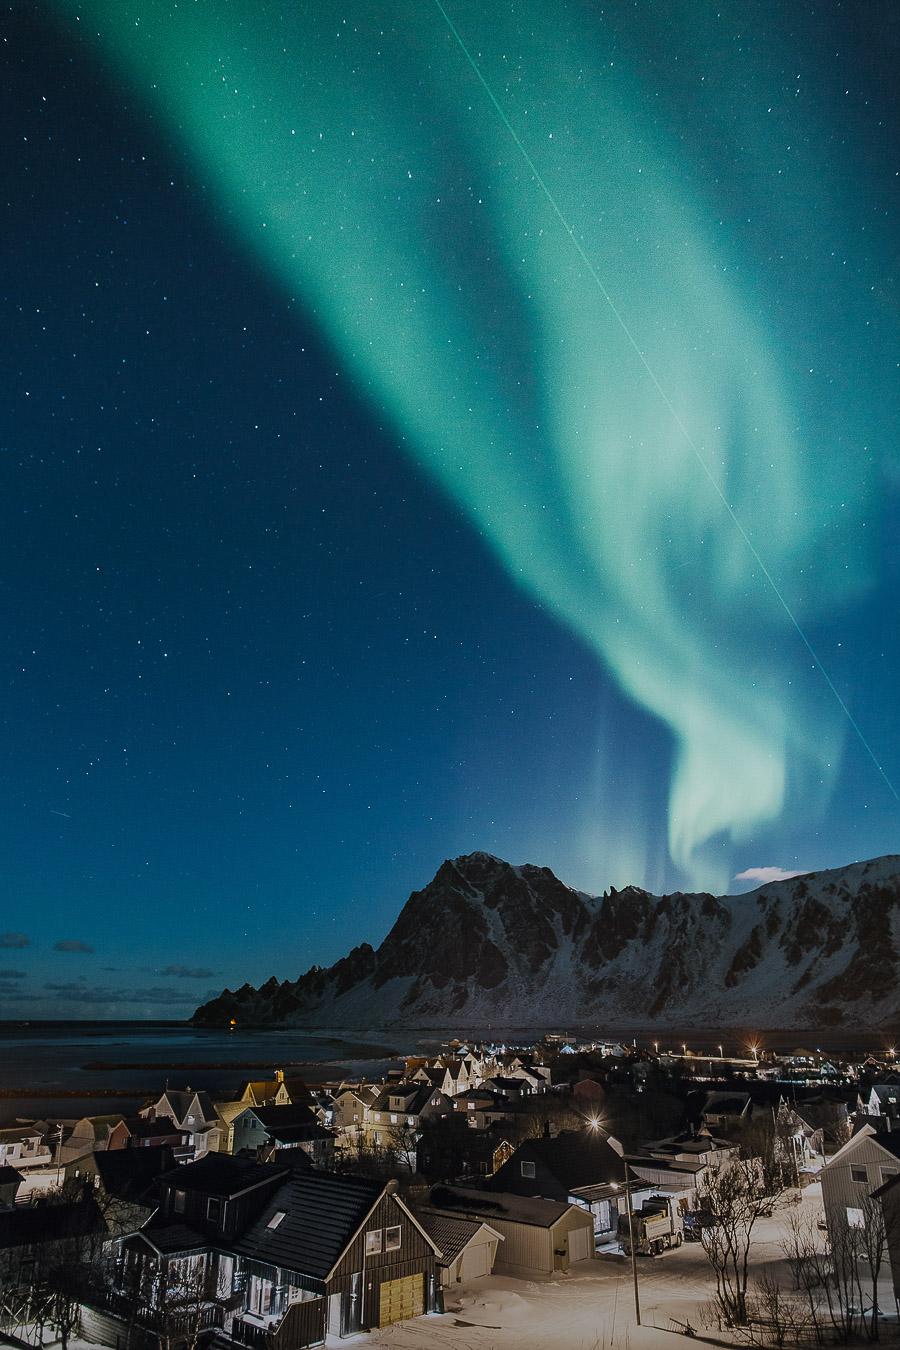 Northern lights dancing over Bleik